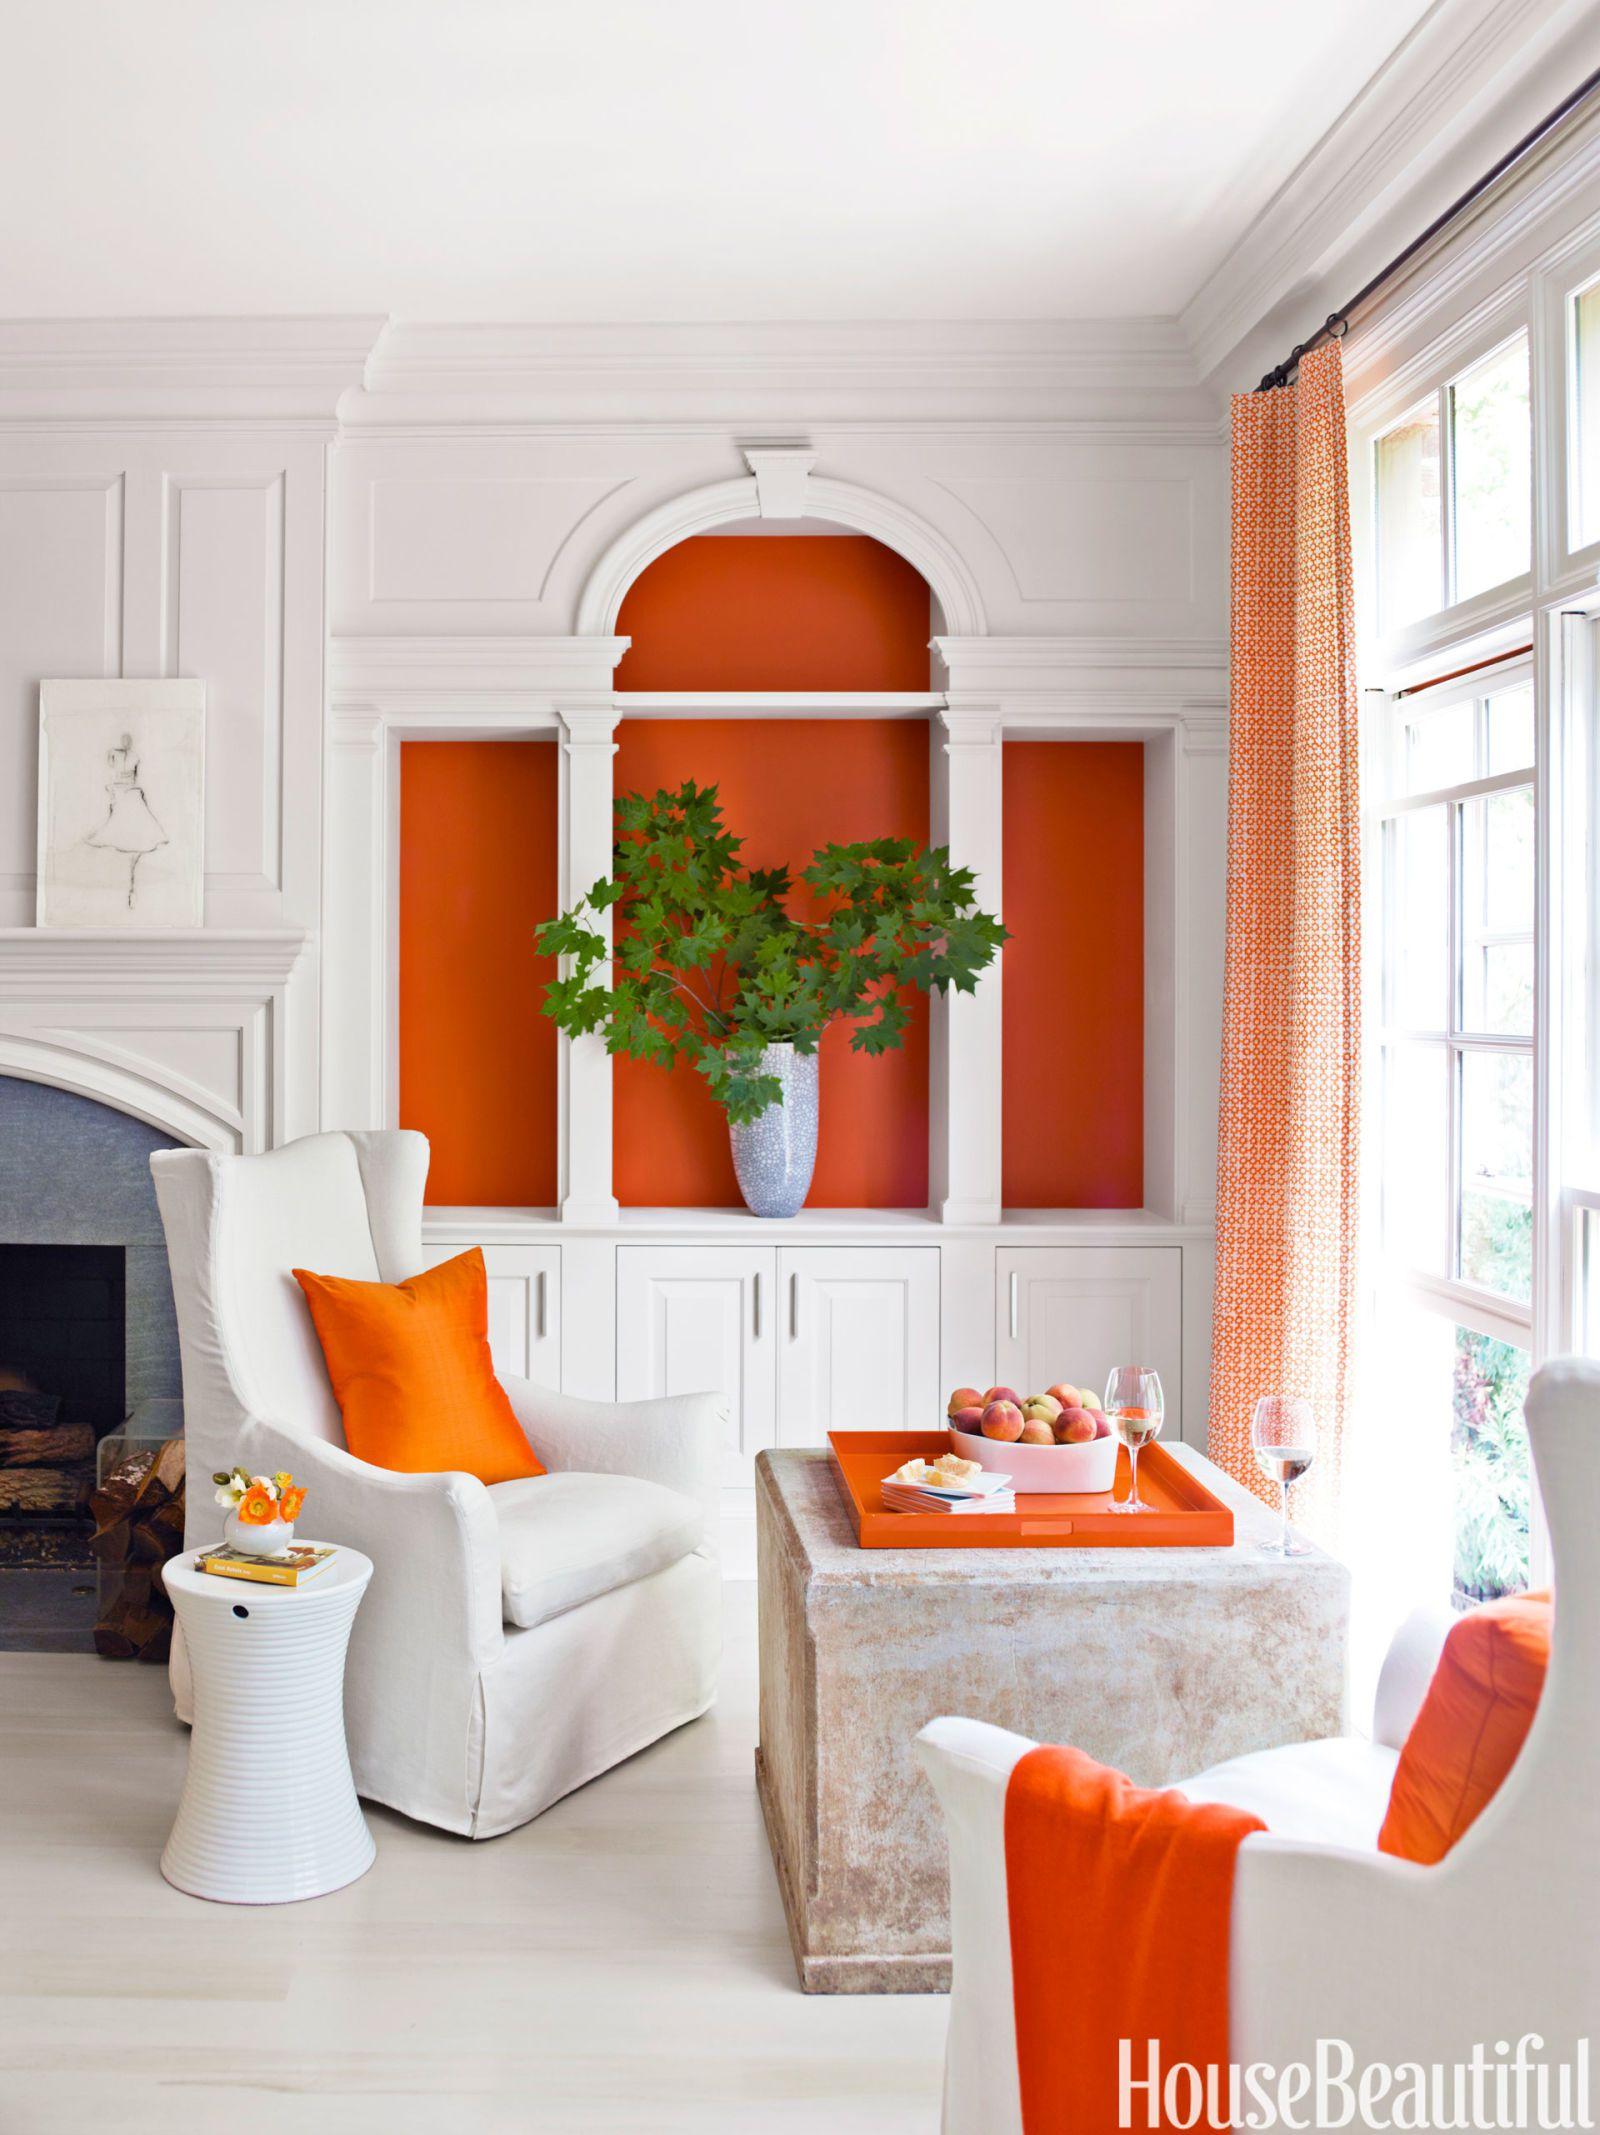 20+ best living ideas - simple furnishing and furnishing tips TJHESWK